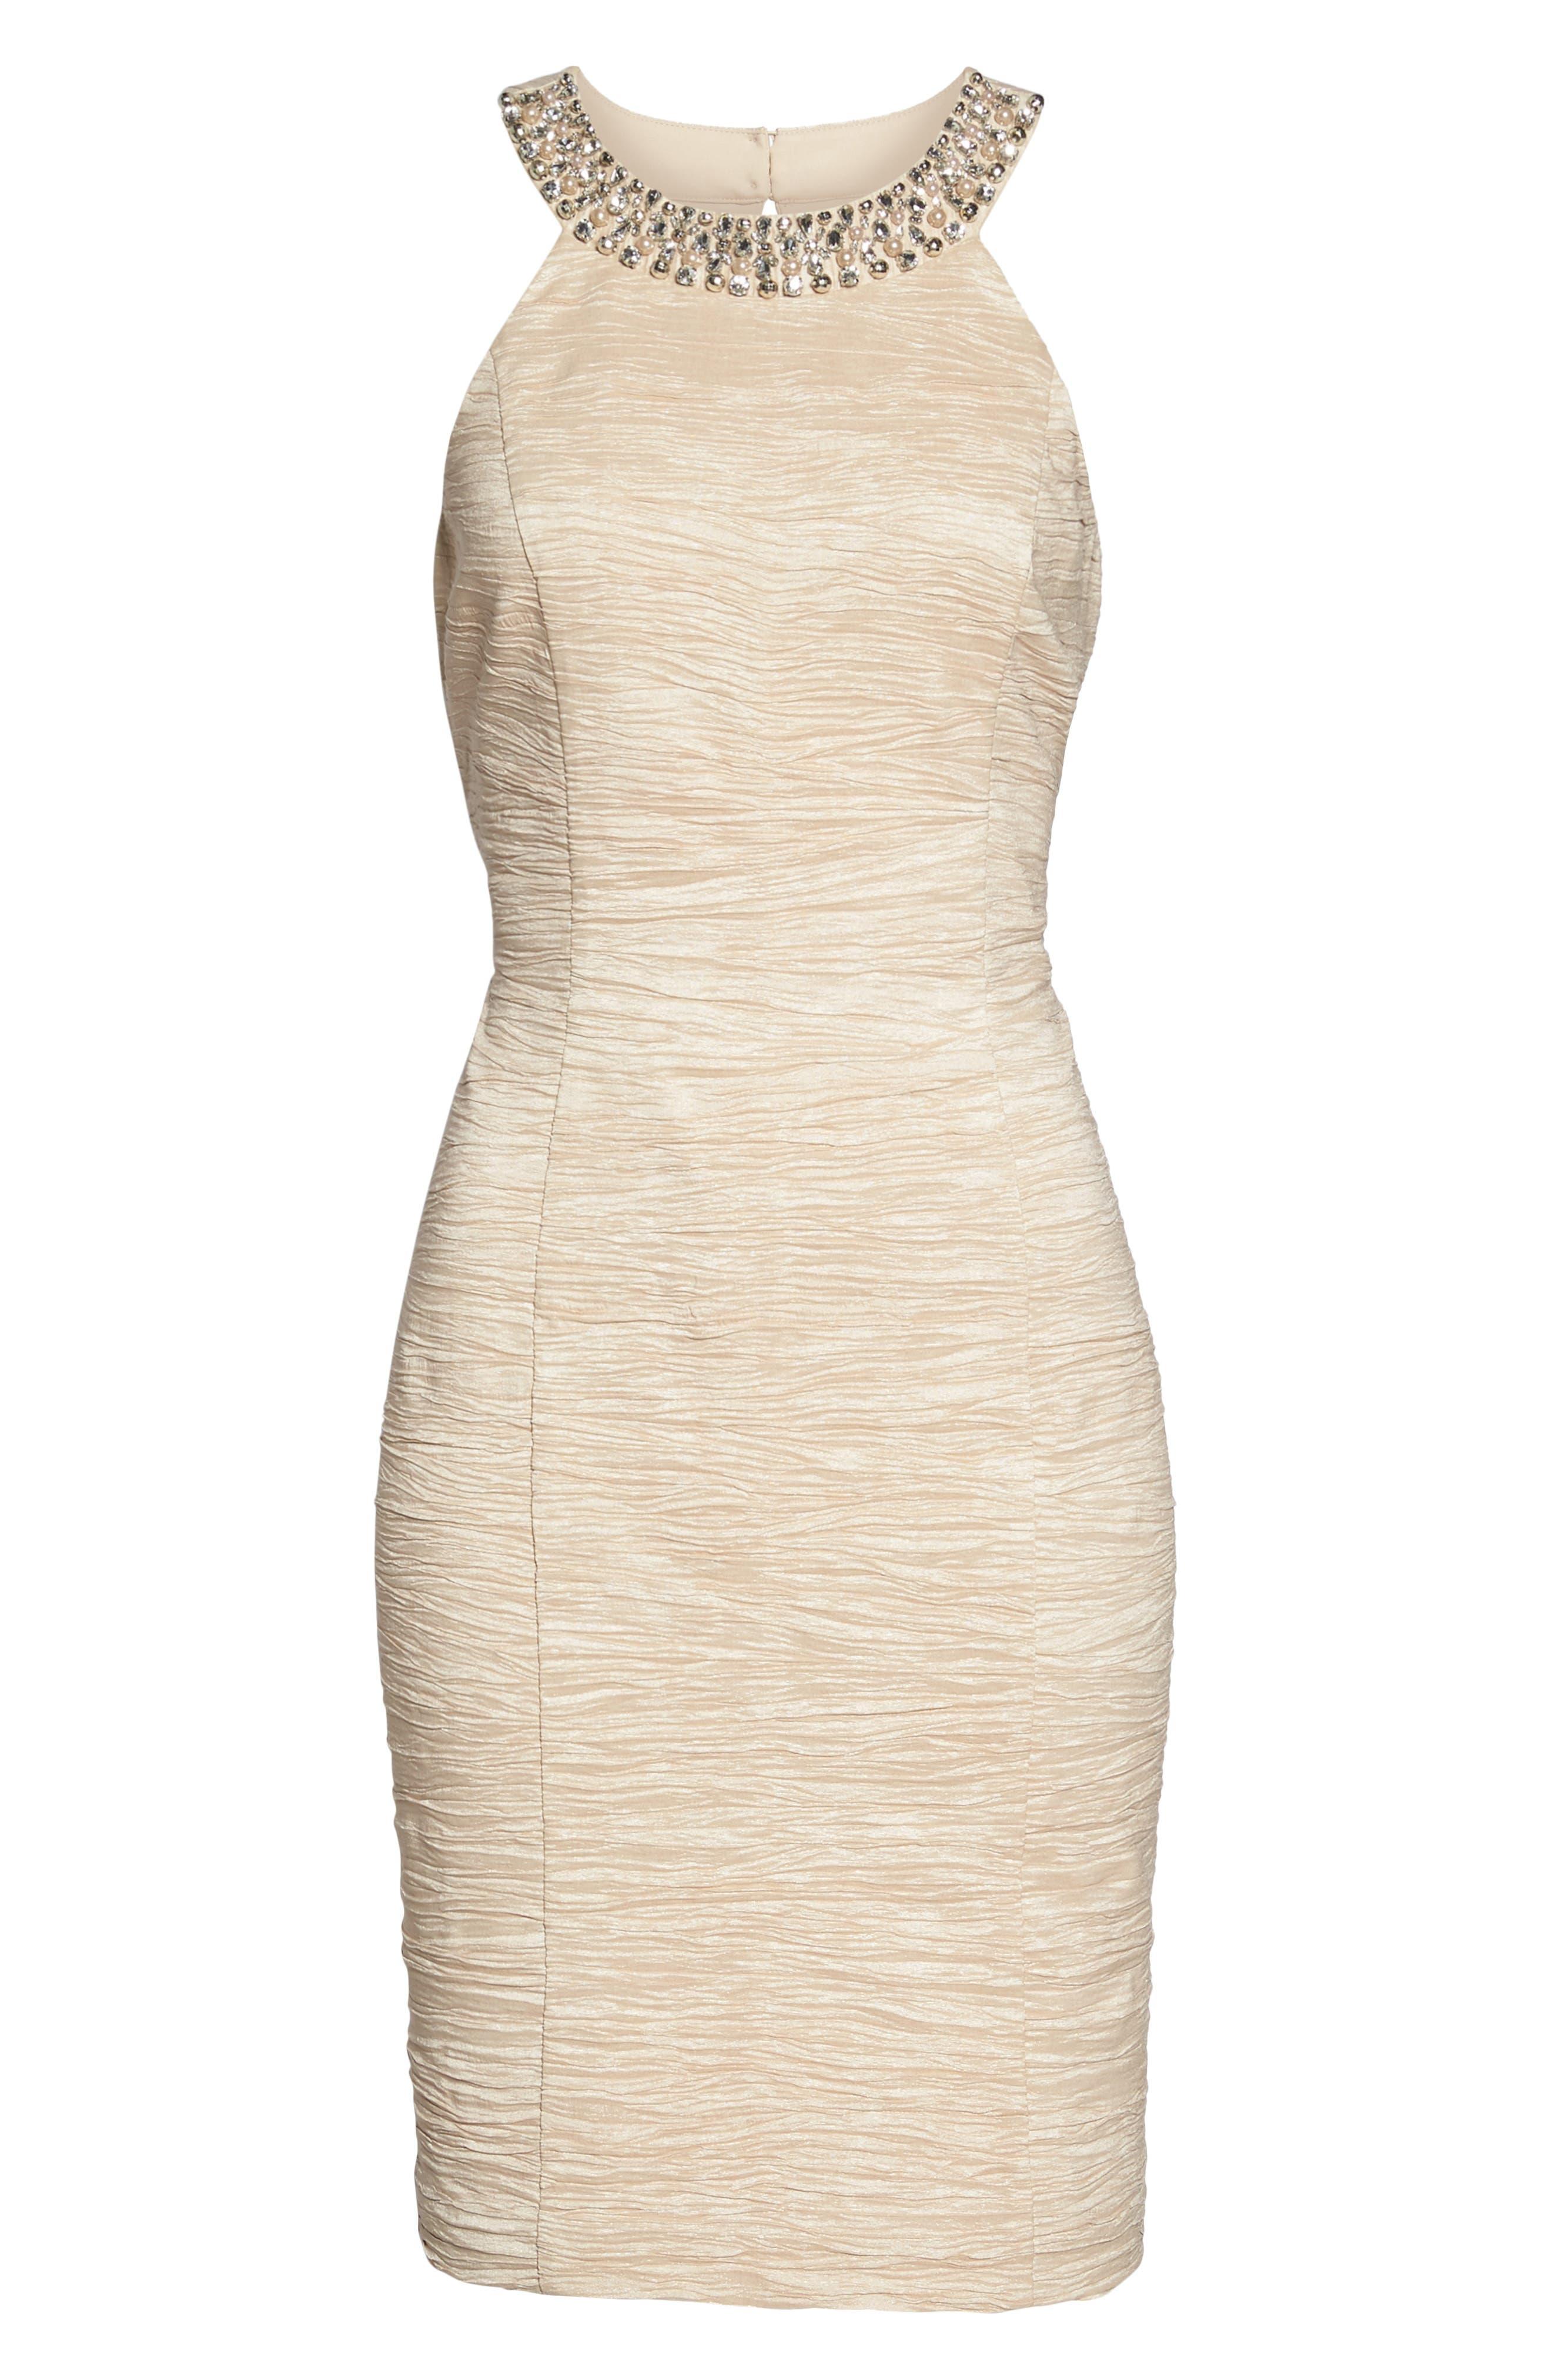 Embellished Crushed Taffeta Sheath Dress,                             Alternate thumbnail 6, color,                             250